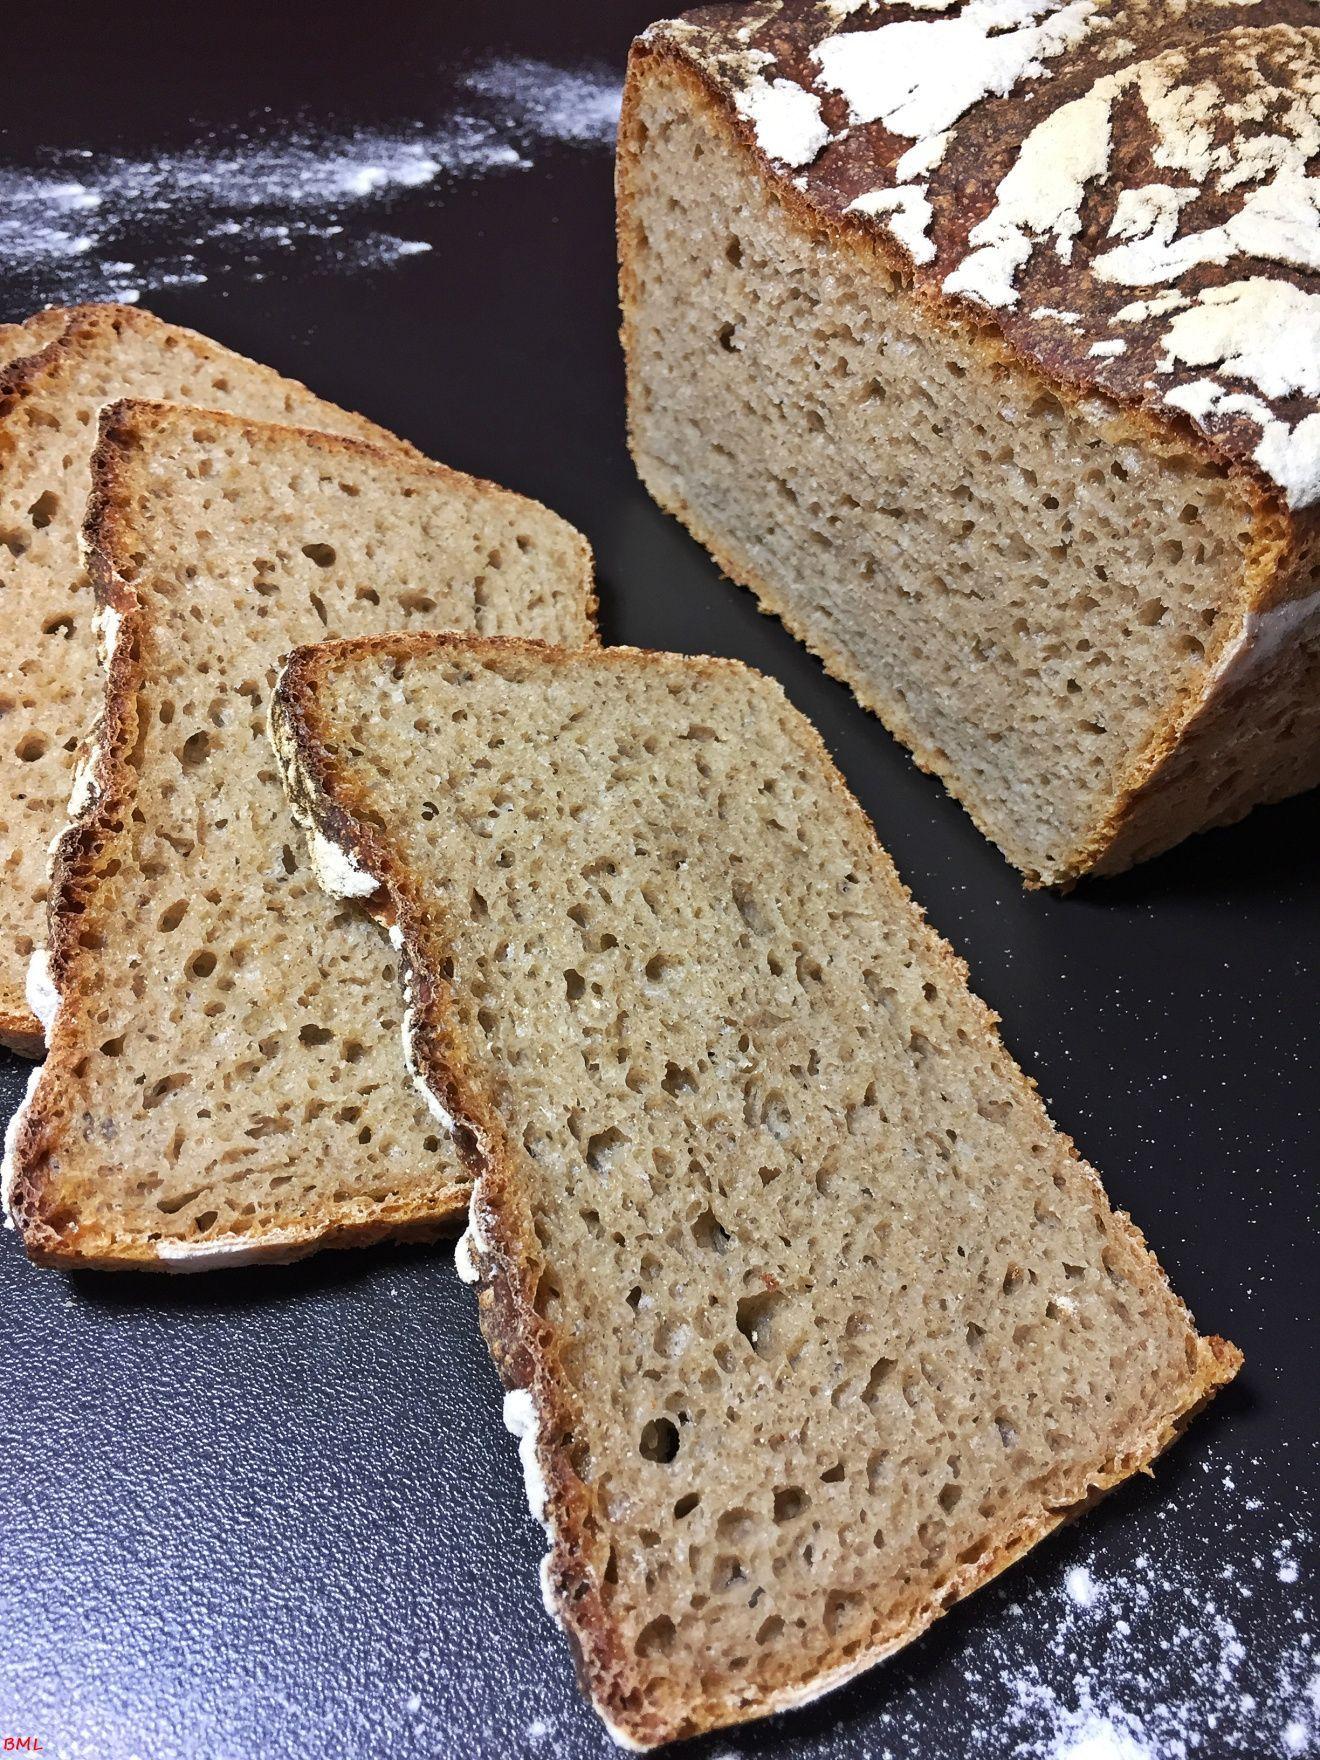 Gesäuertes Brot